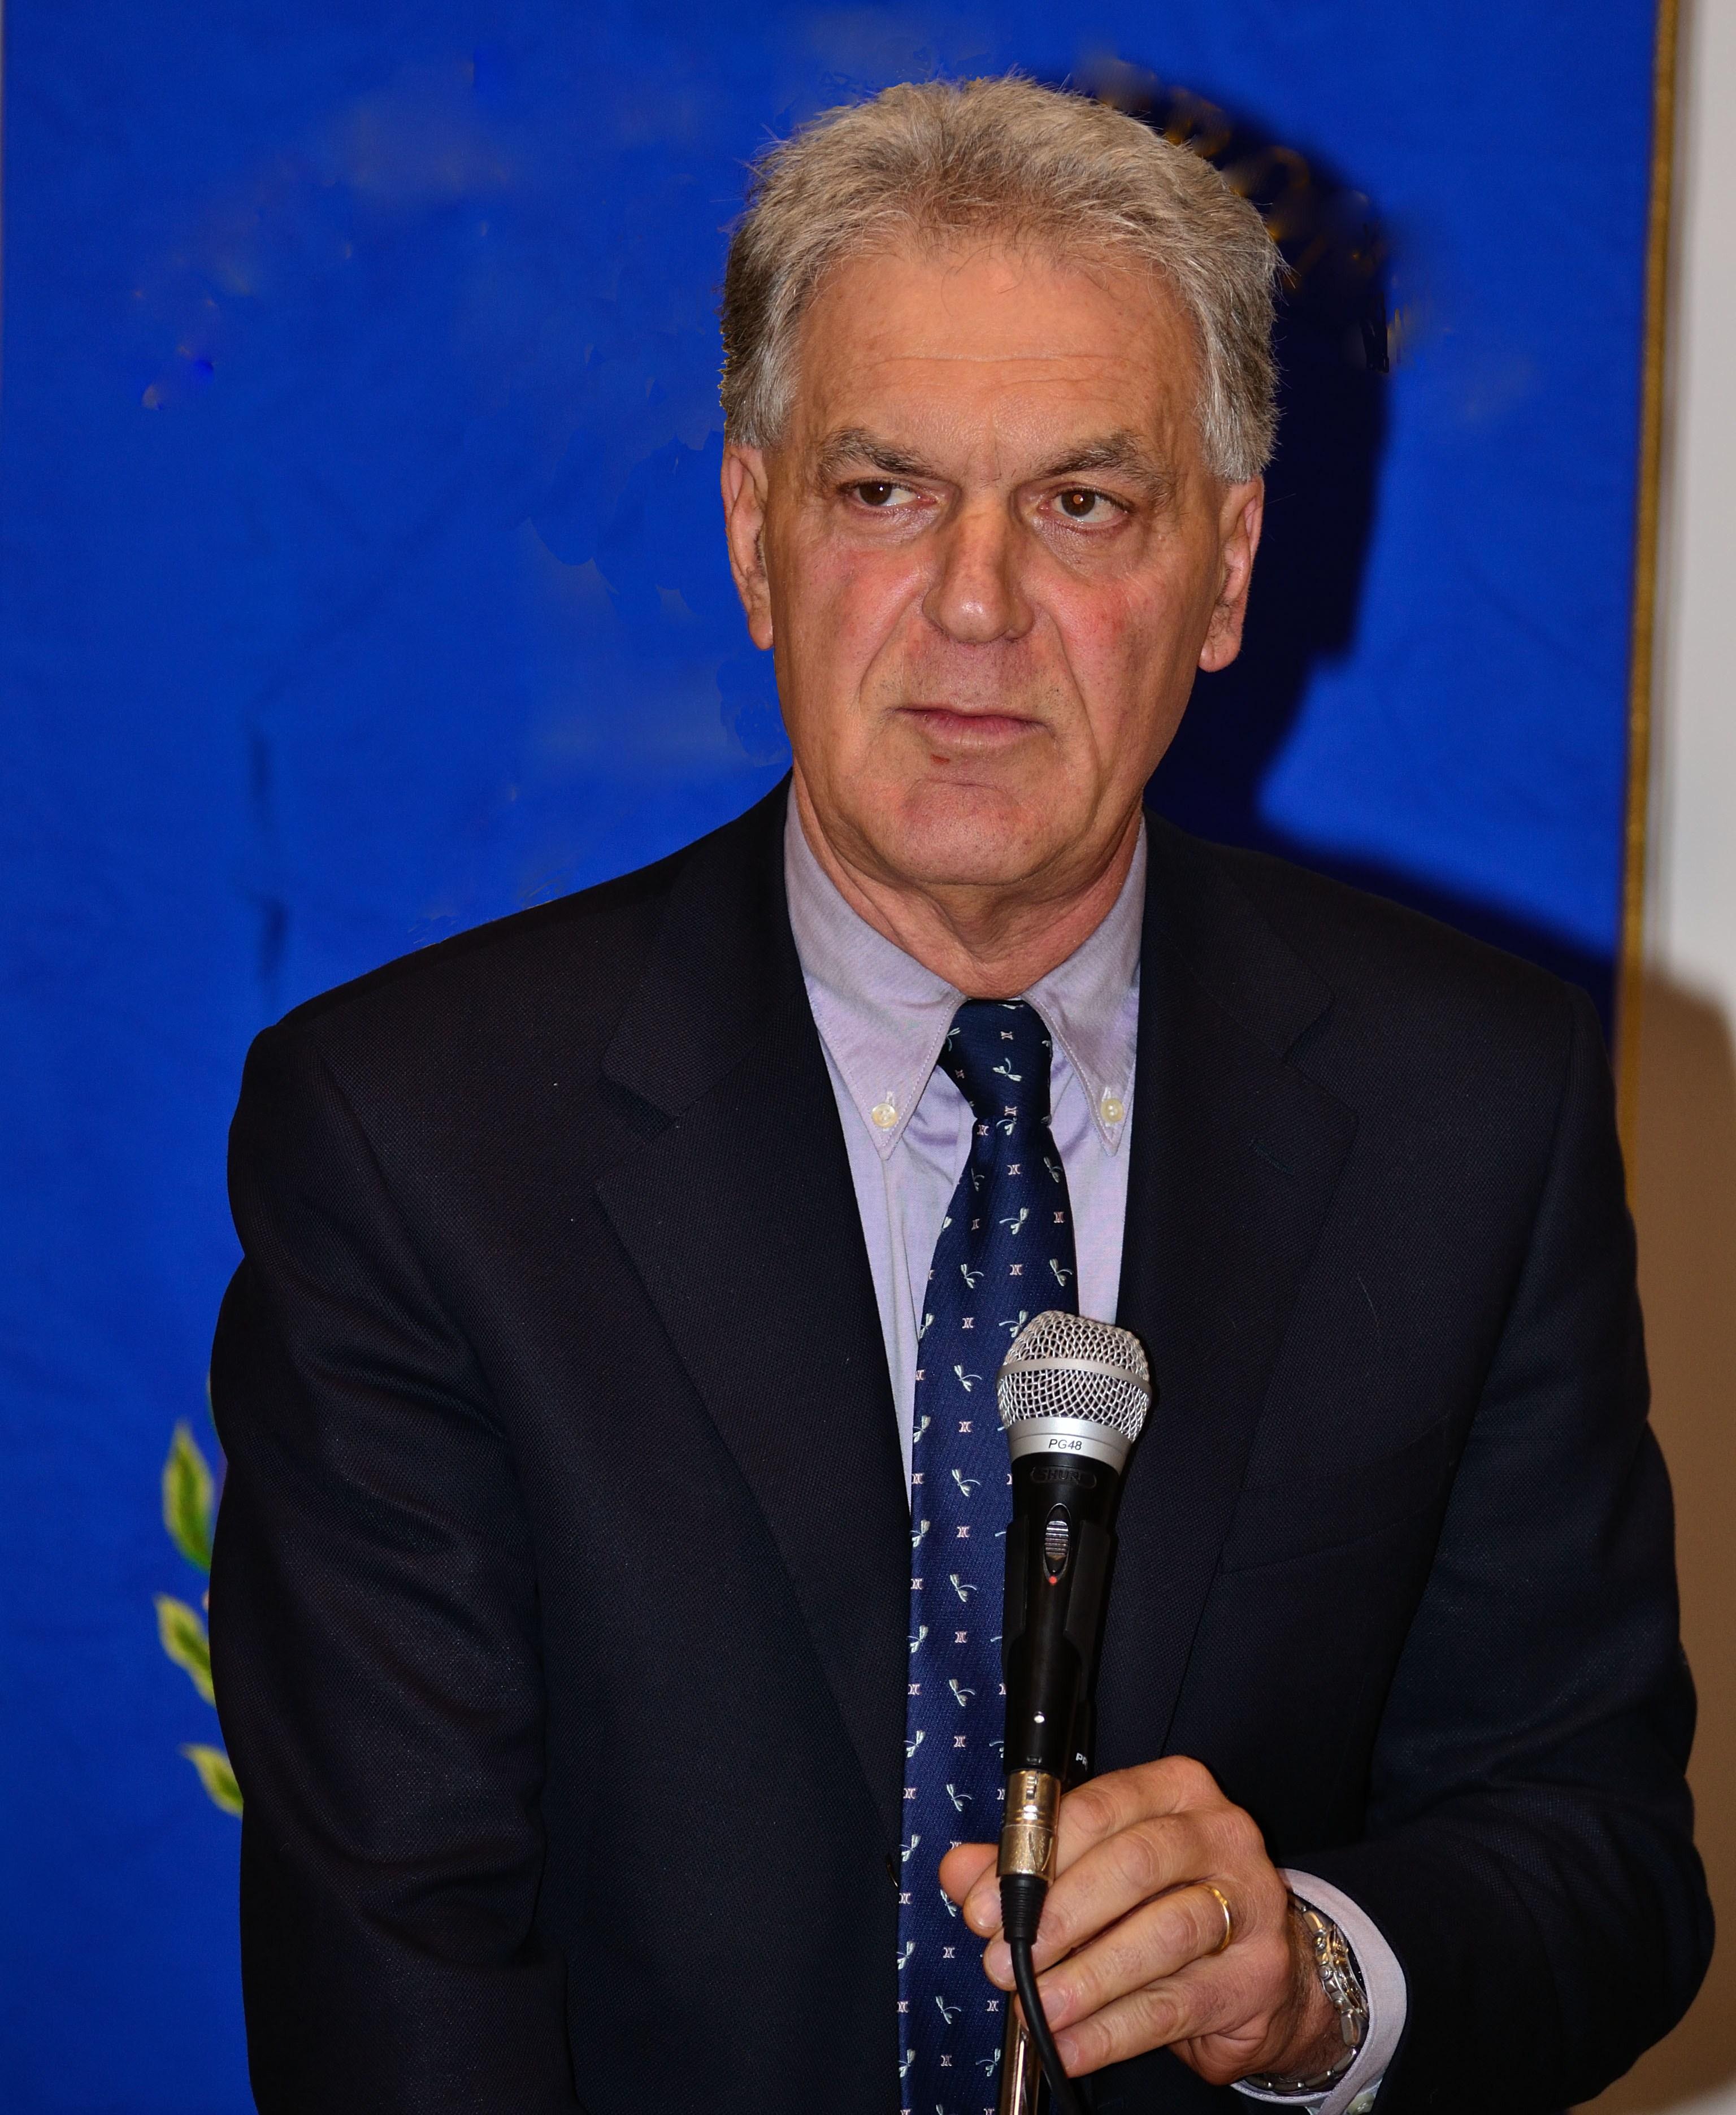 Presidente Celani